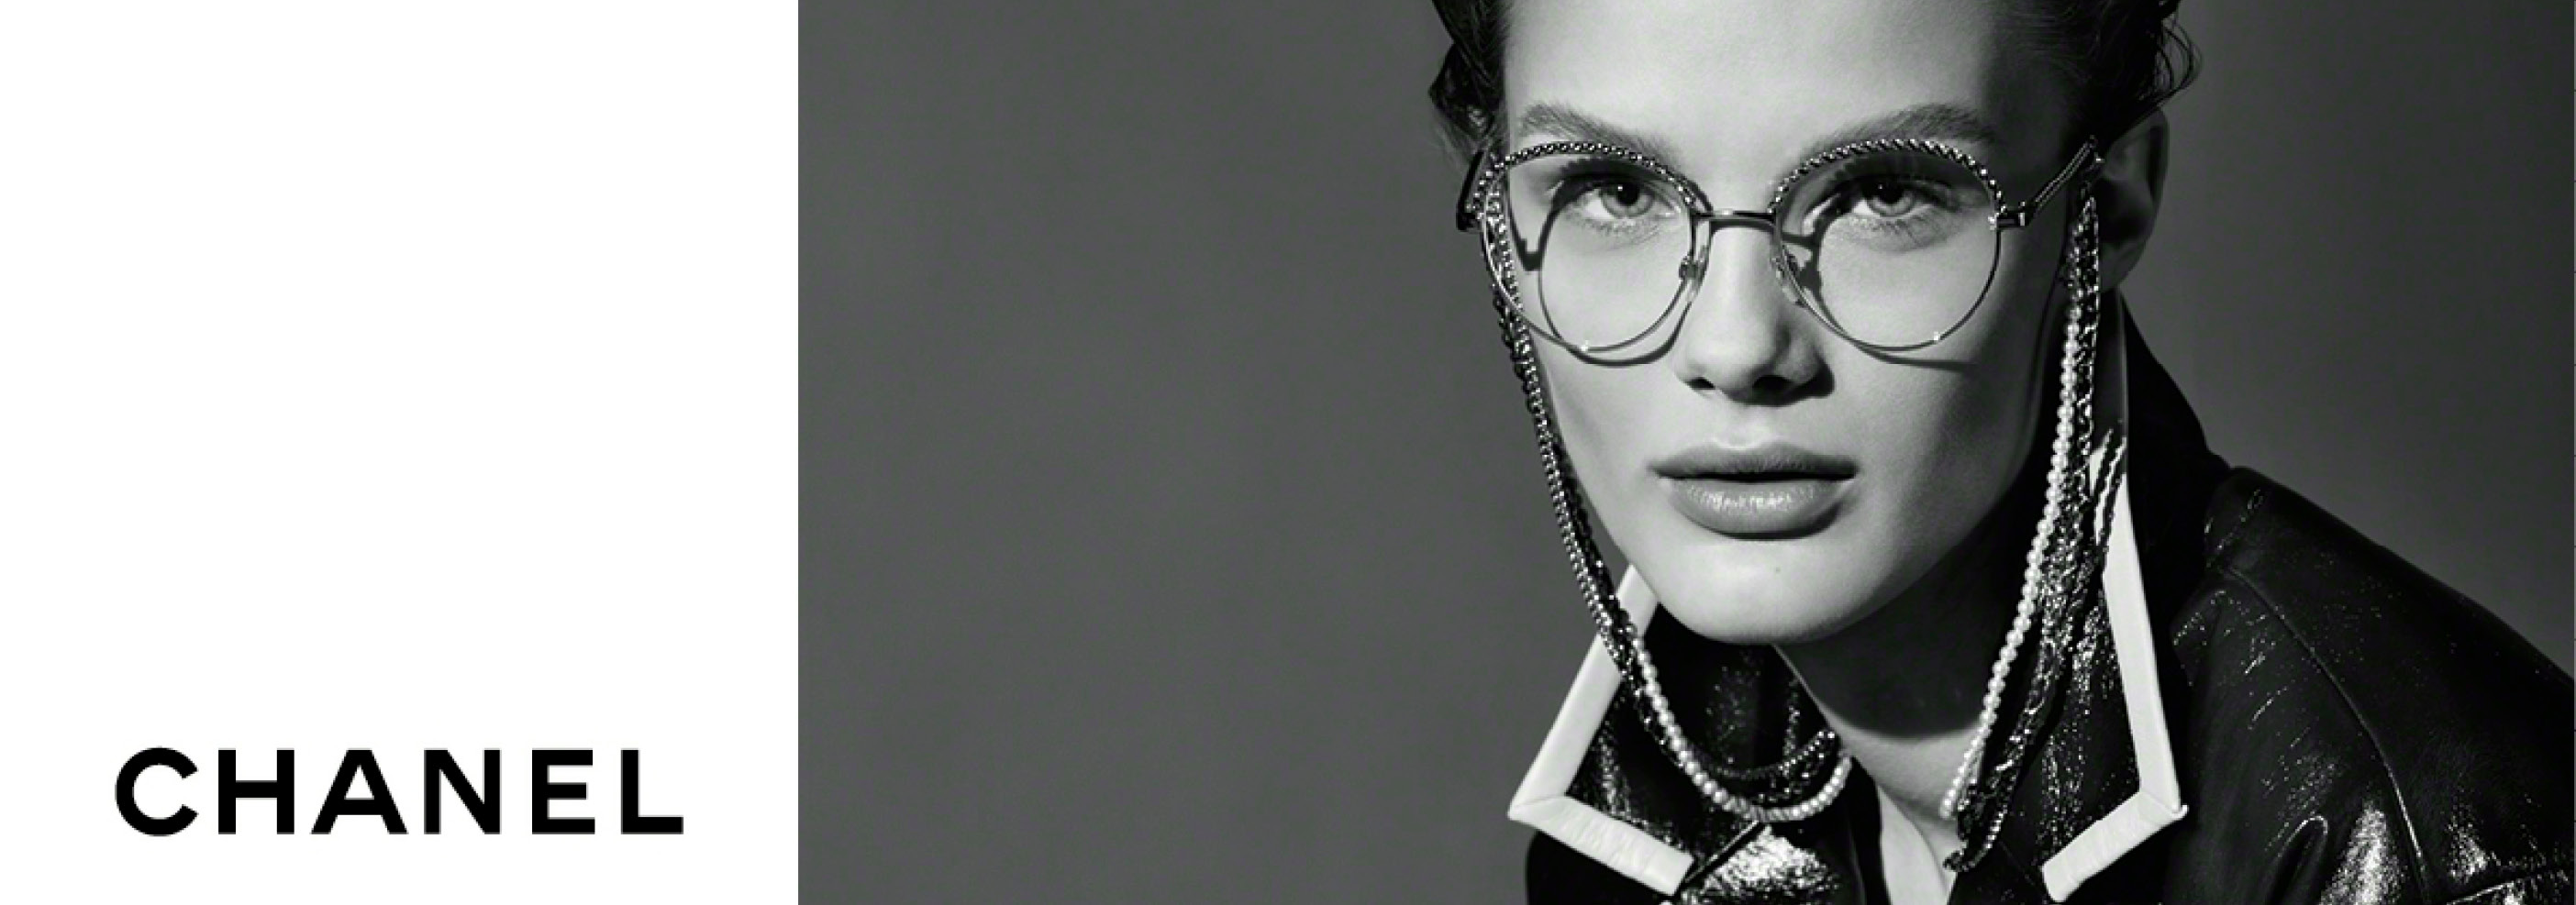 76771c89601dc5 Website VDLO Banner Chanel 042019